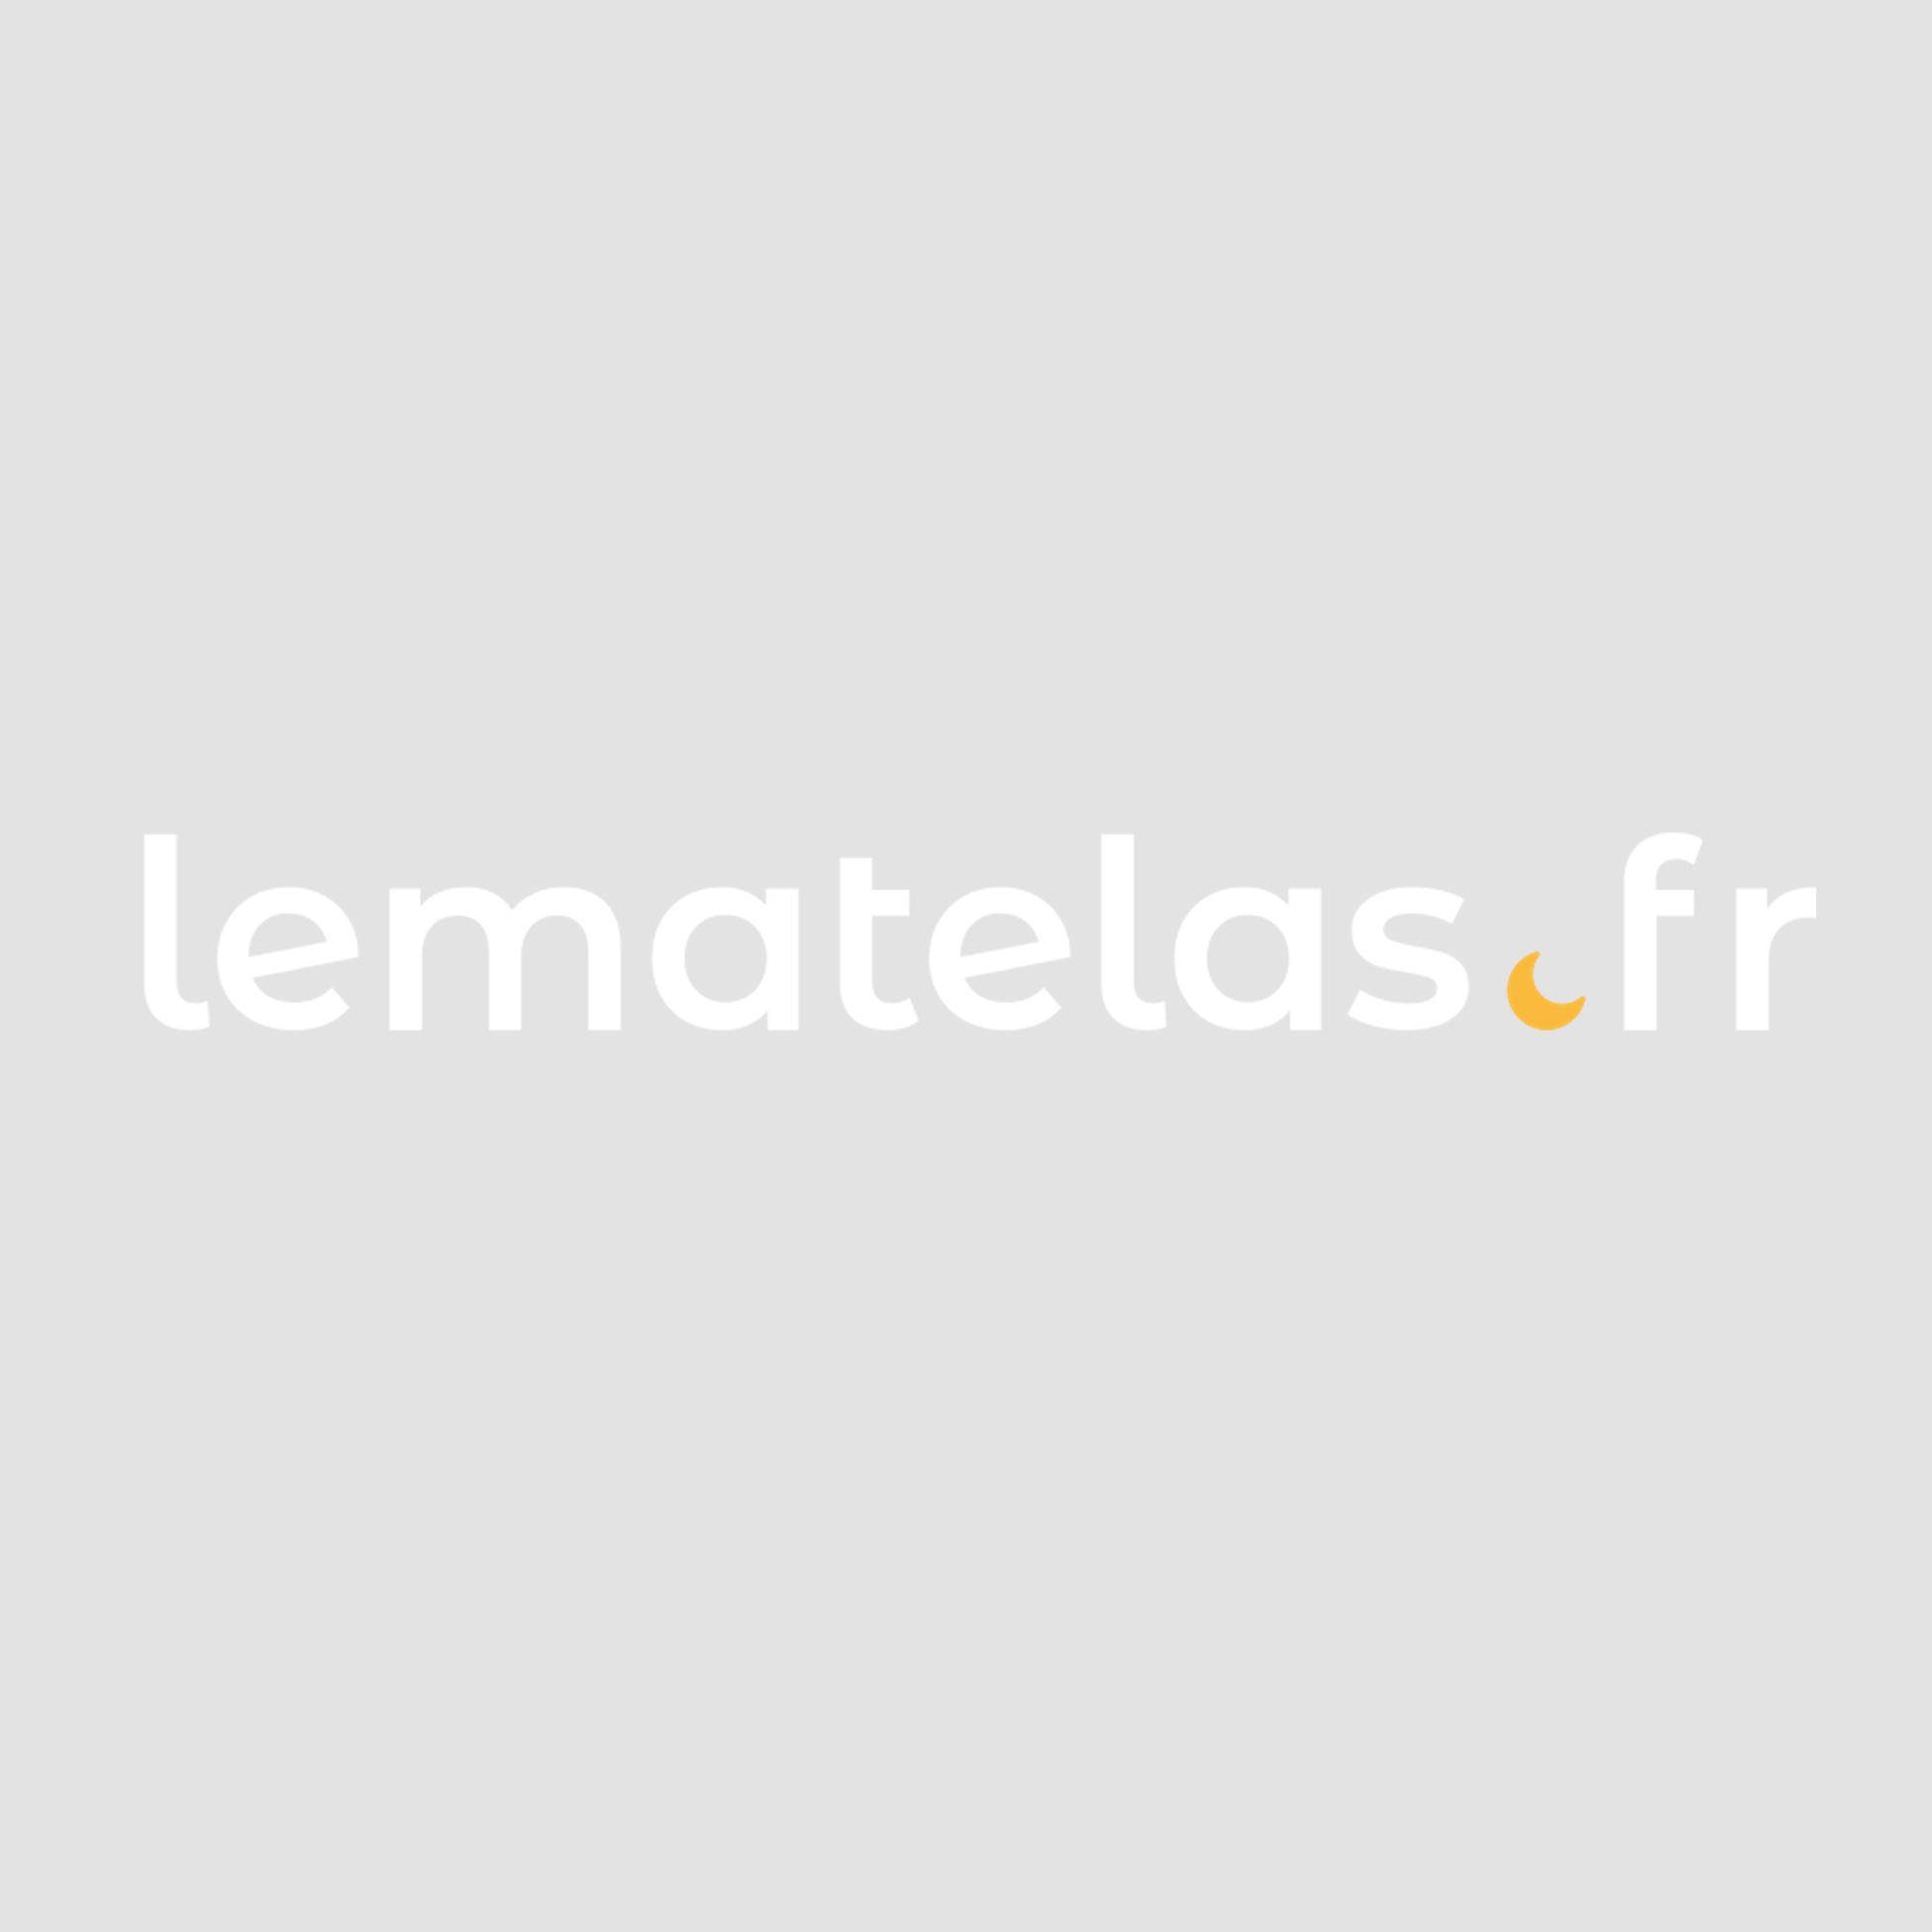 Banquette ajustable en pin massif blanc matelas vert inclus 75x200